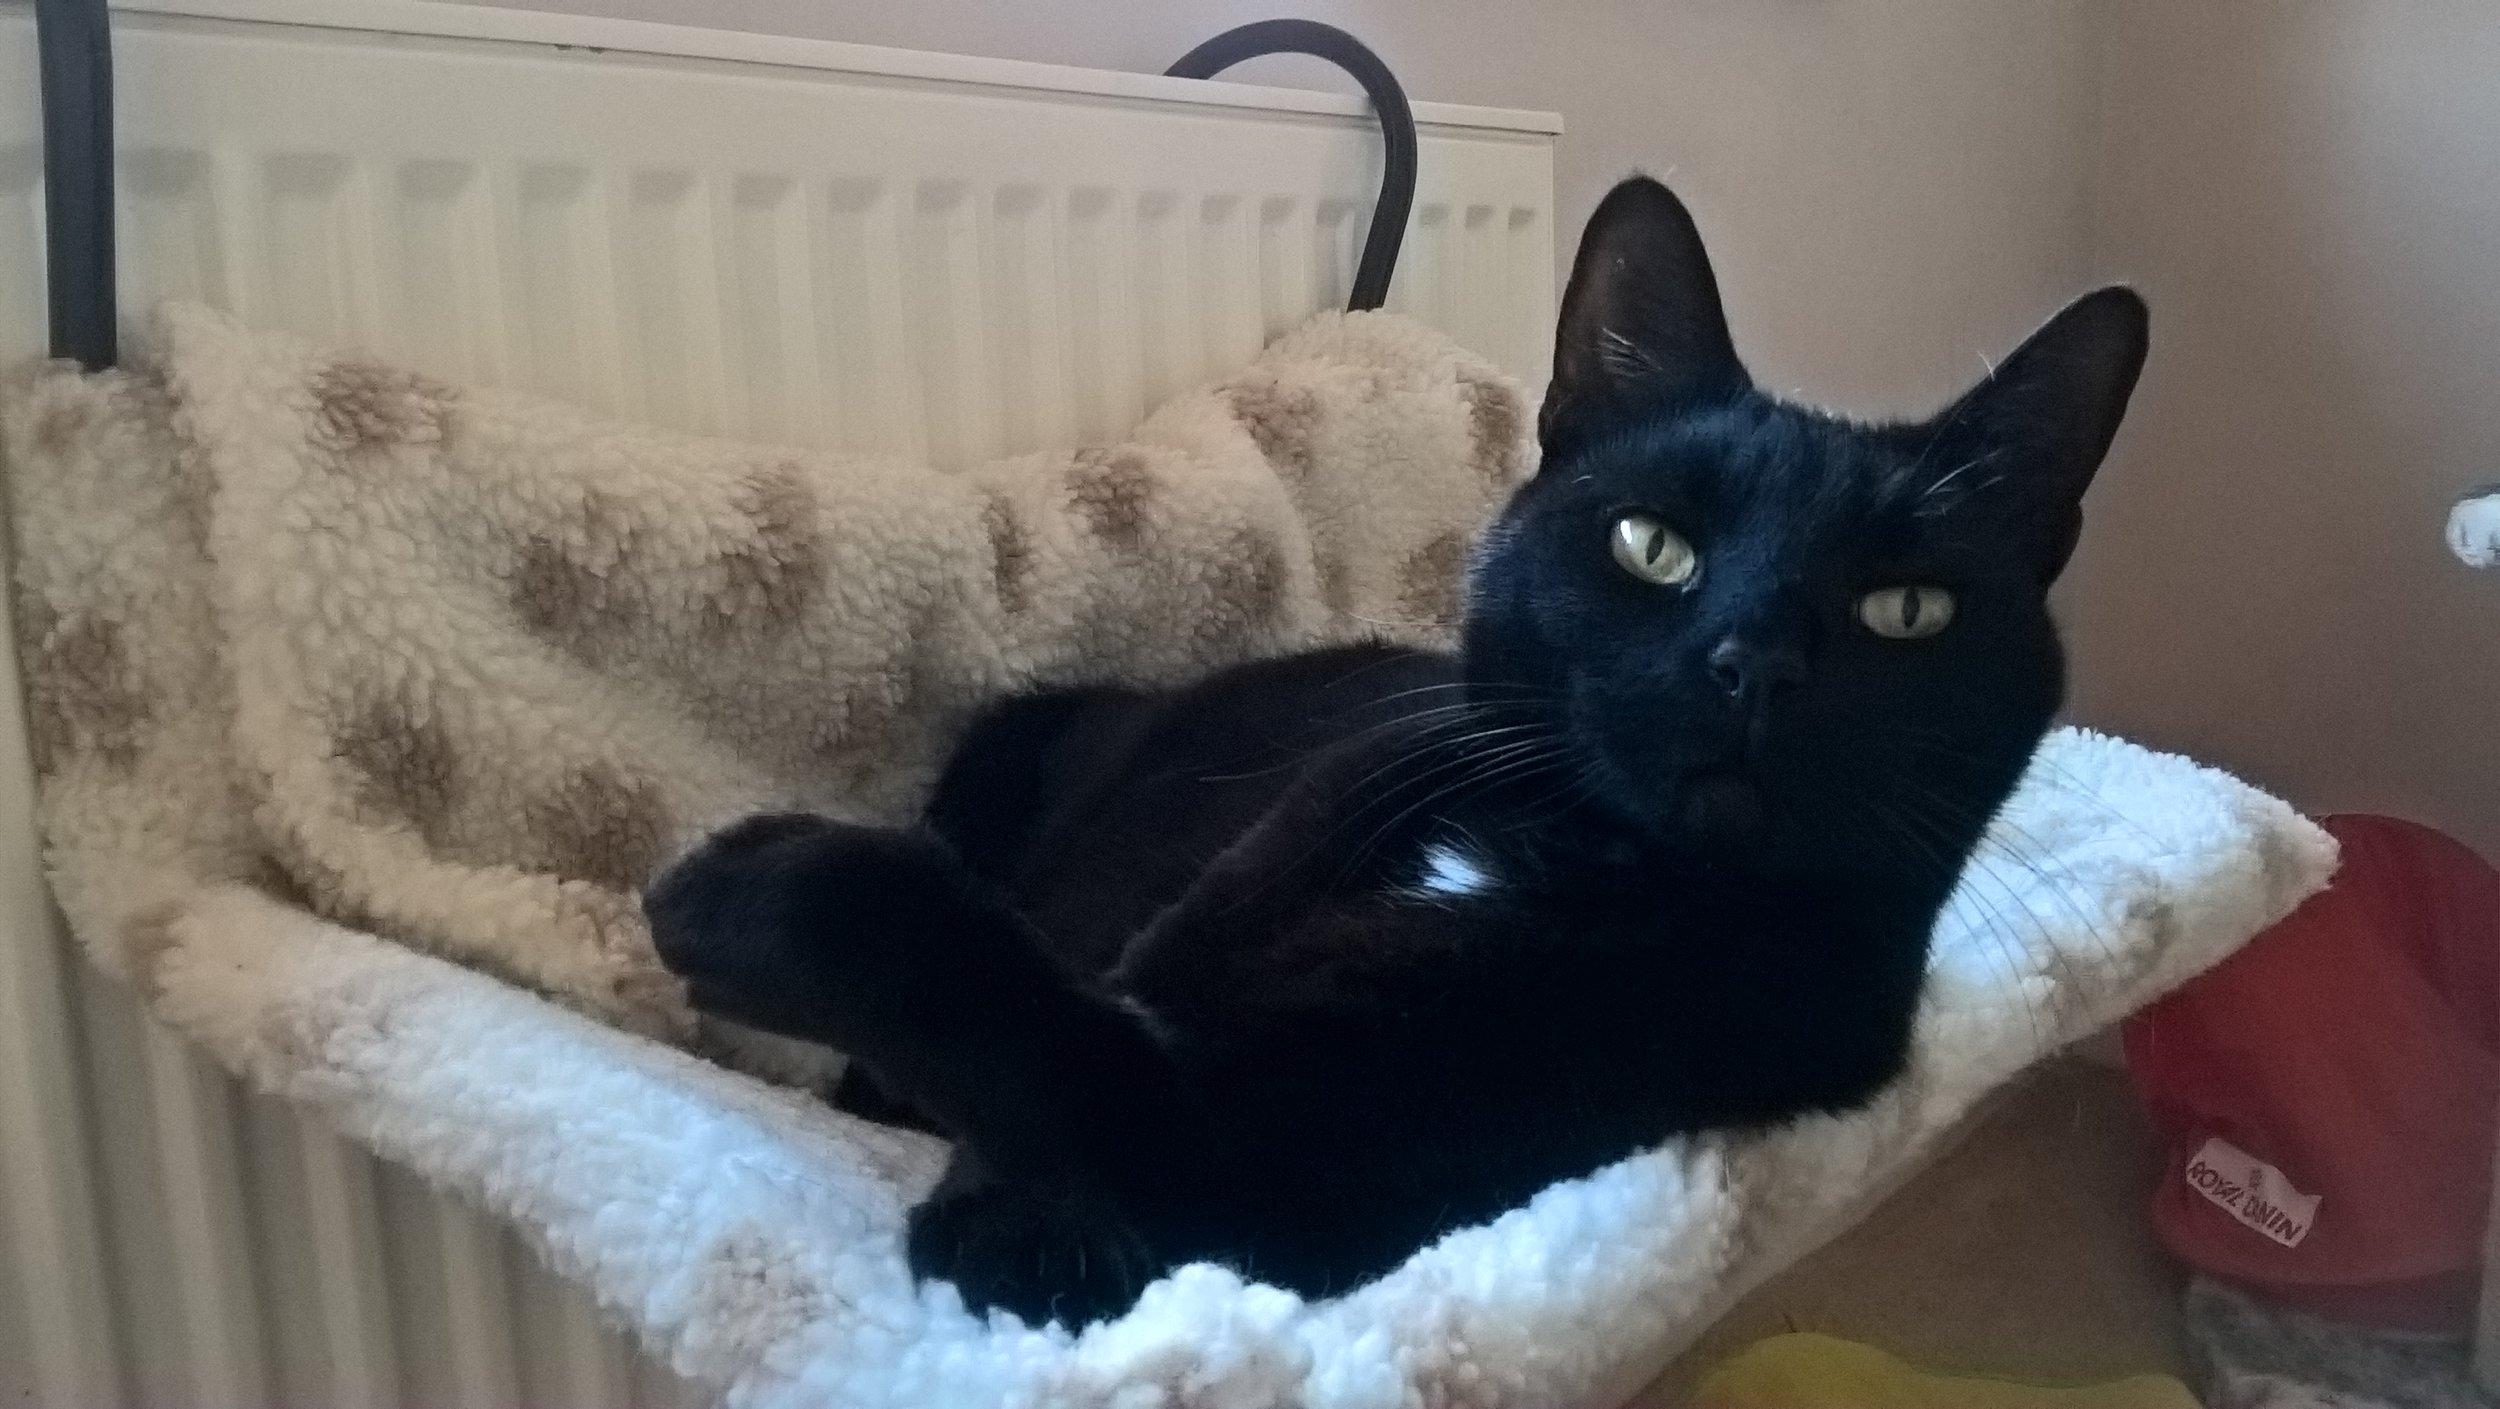 Minnie - Adopted Feb 17